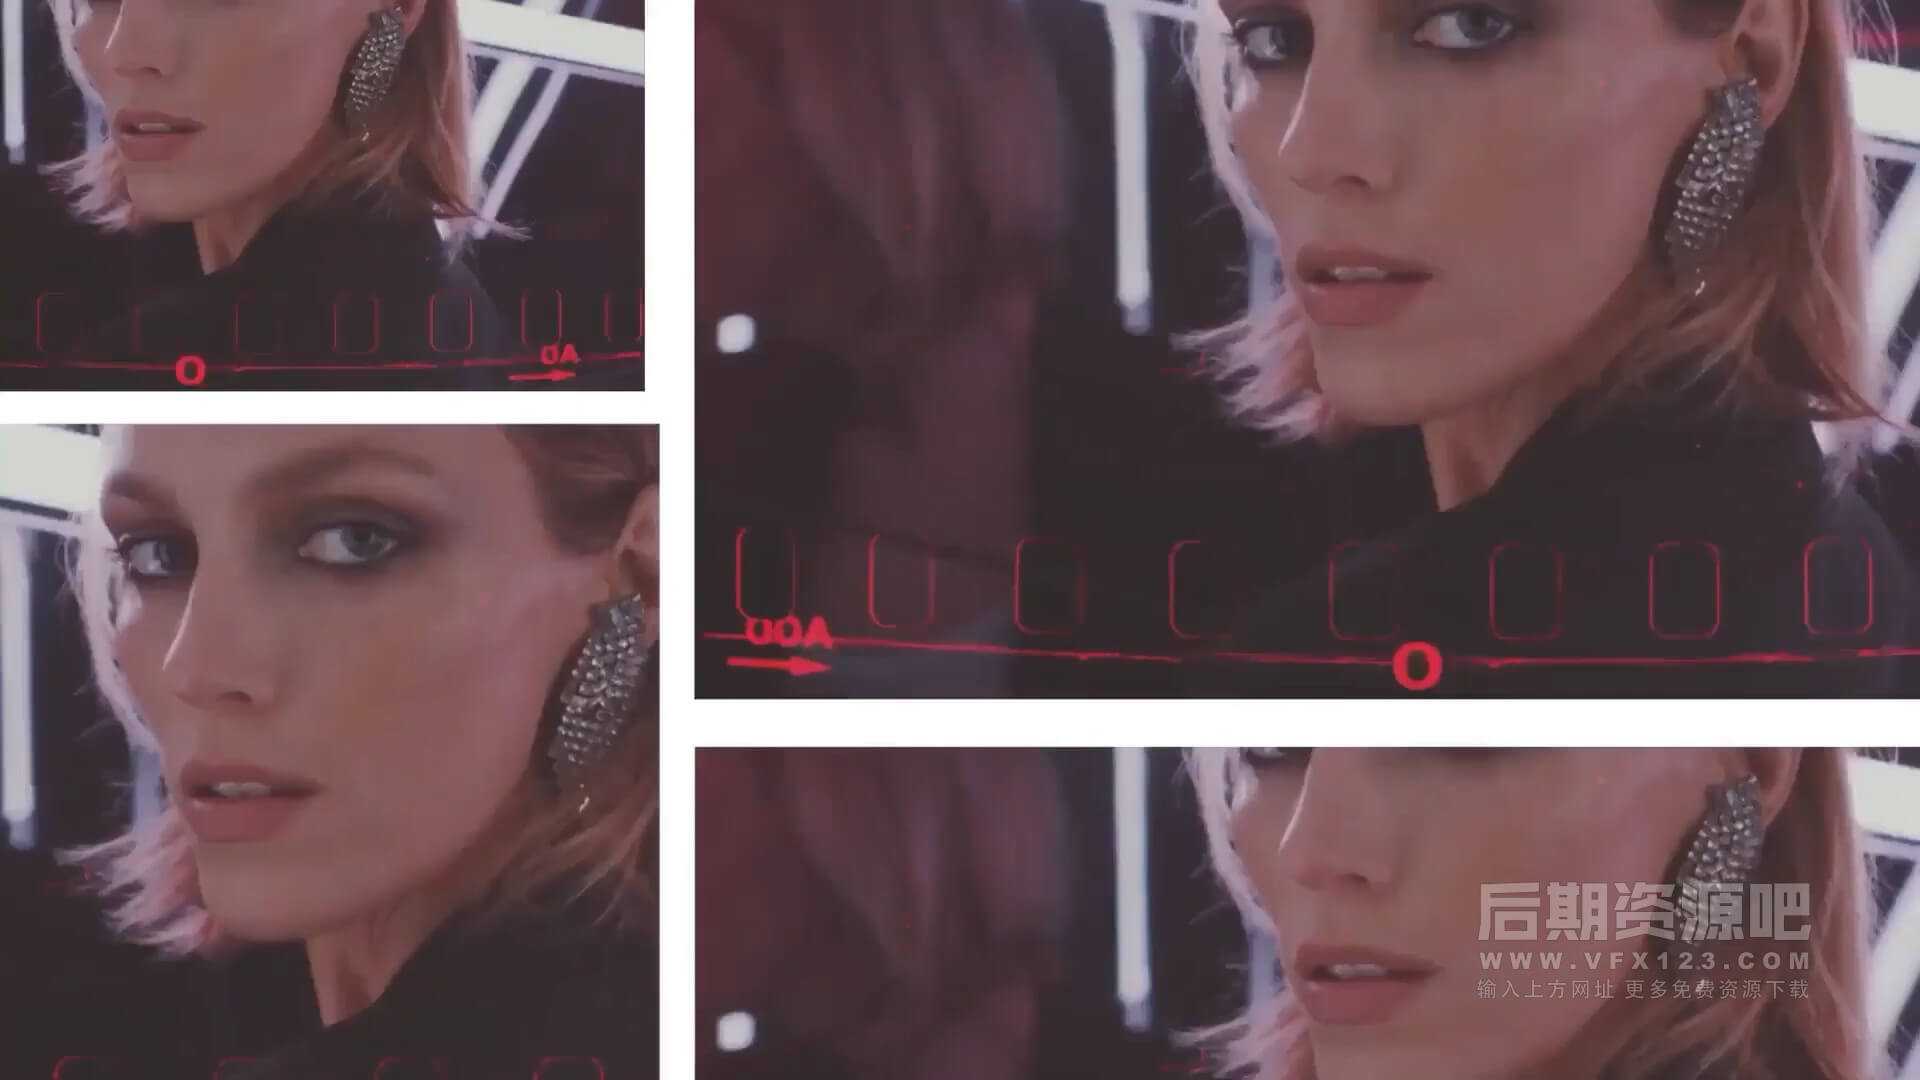 fcpx主题模板 现代时尚动感服装写真宣传片头 Dynamic Fashion Promo